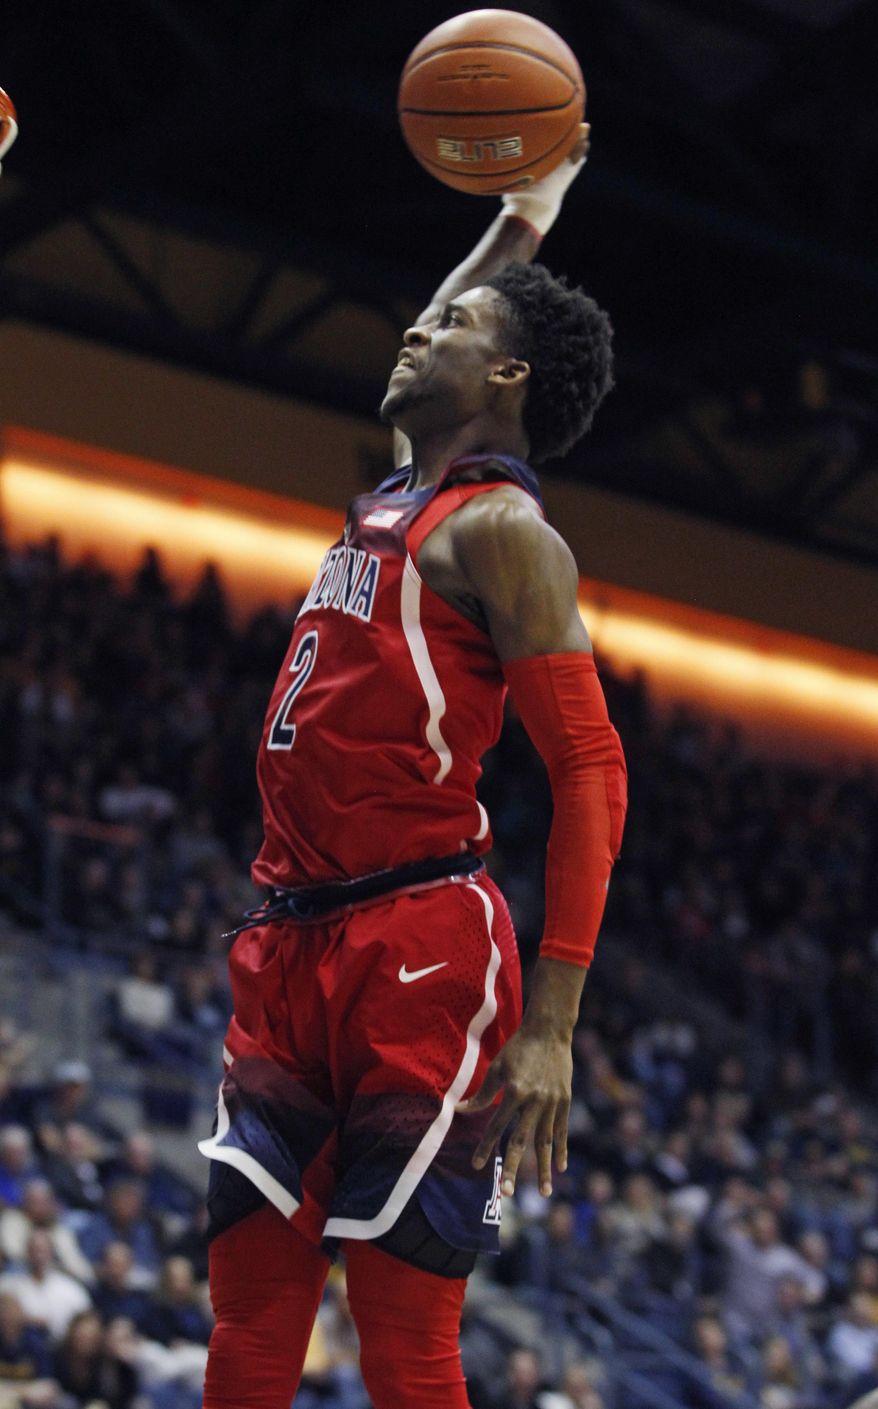 Arizona's Kobi Simmons dunks against California during the first half of an NCAA college basketball game, Friday, Dec. 30, 2016, in Berkeley, Calif. (AP Photo/George Nikitin)